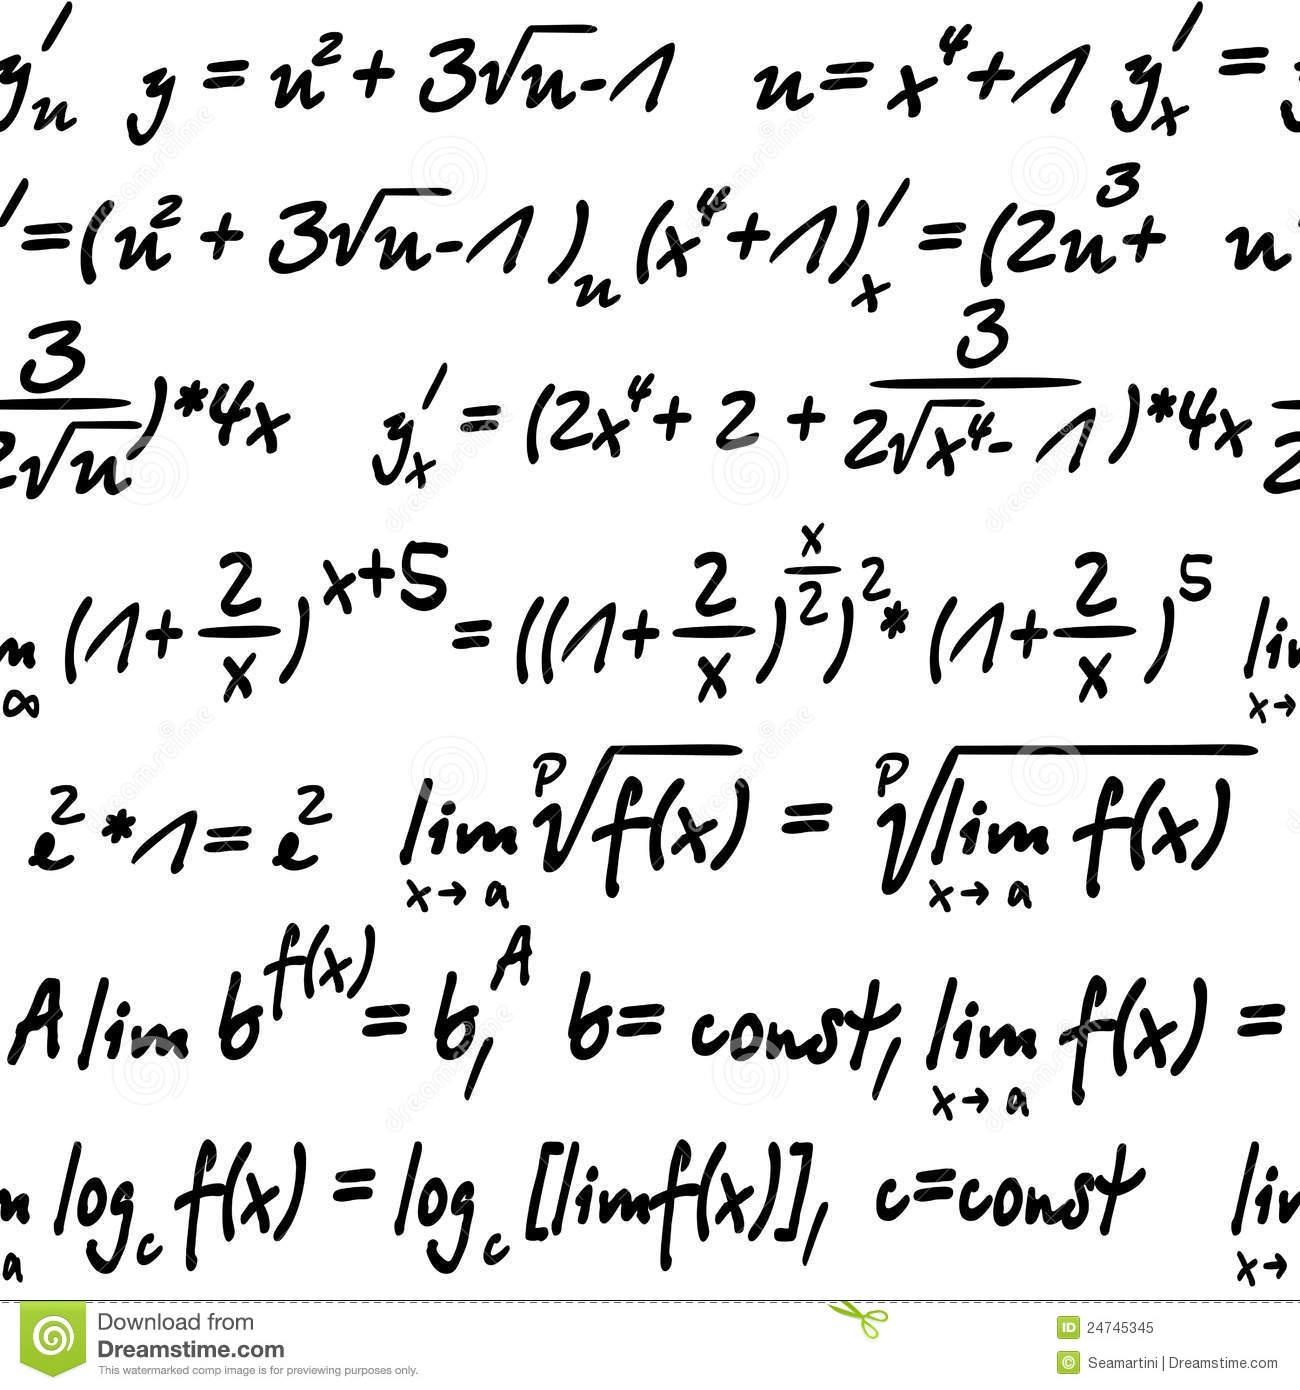 files/images/algebra-seamless-24745345.jpg